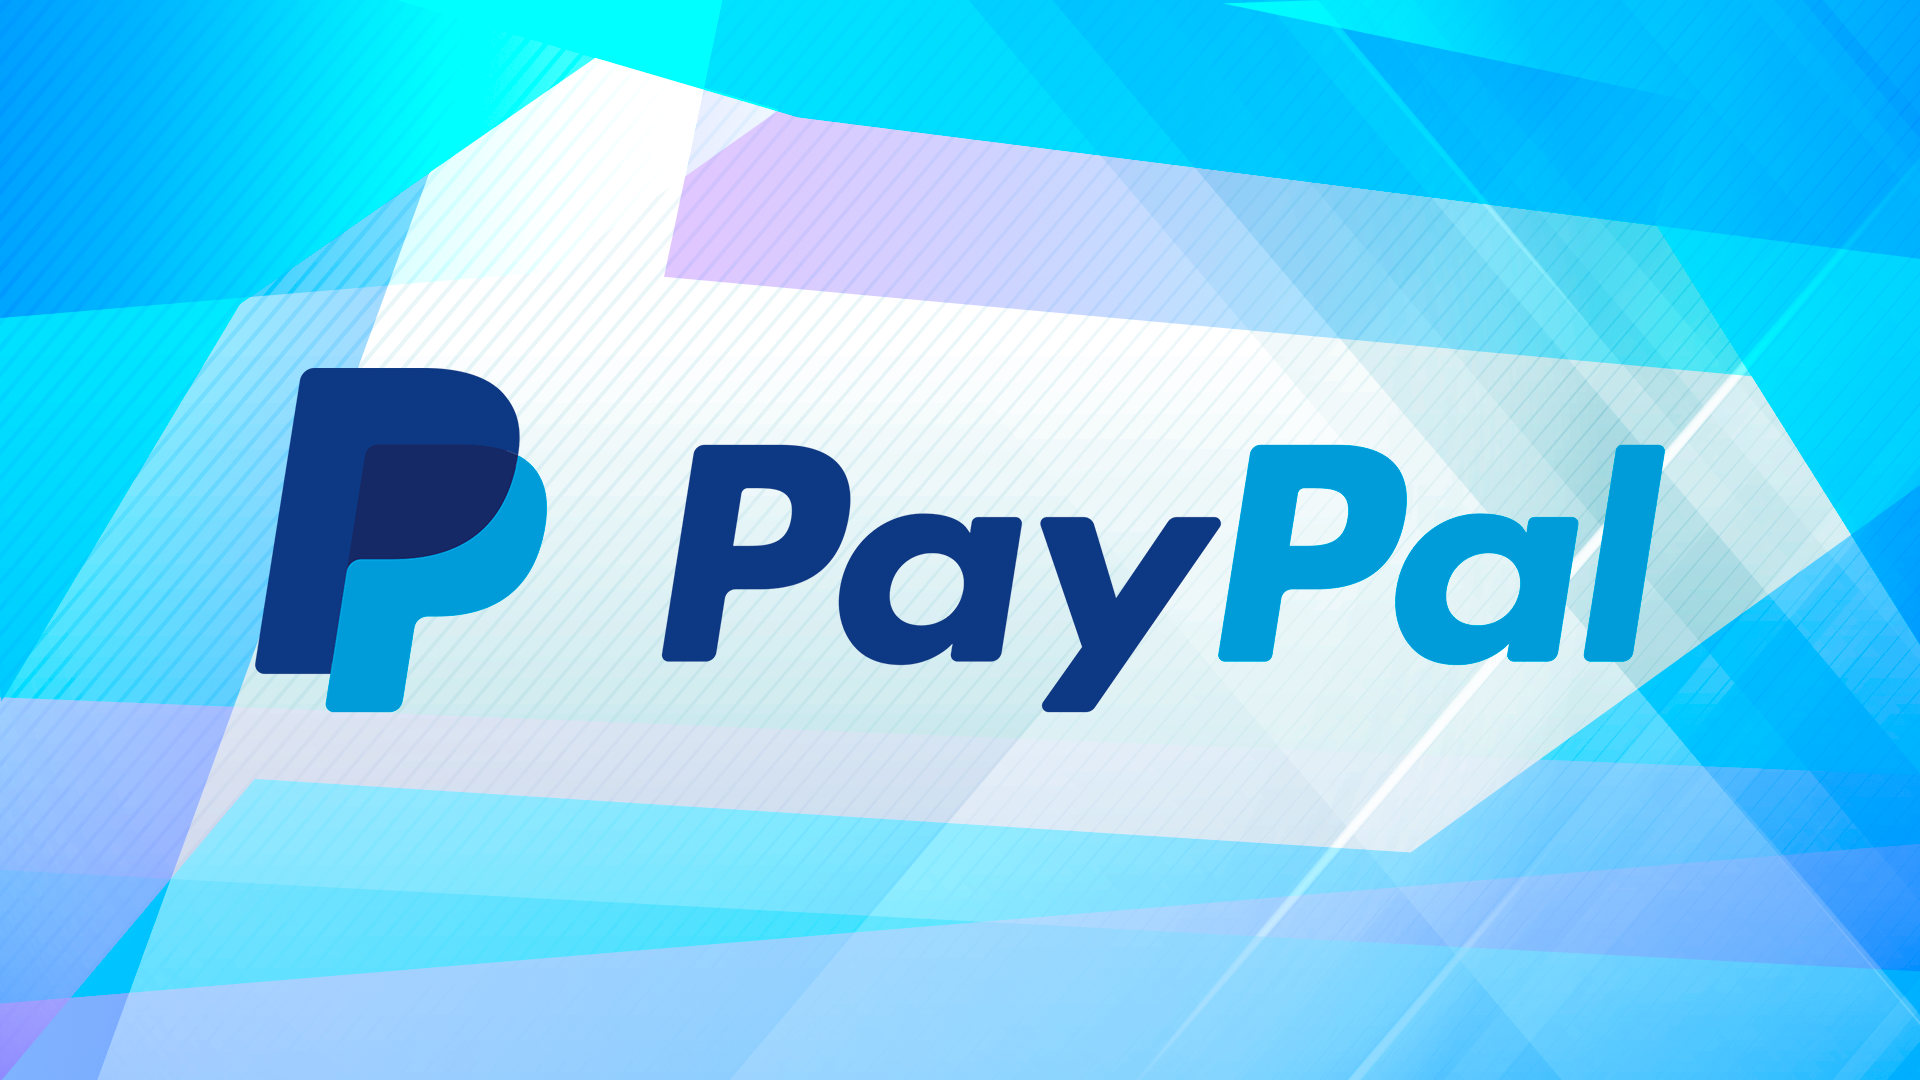 Paypal, ebay paypal, PayPal Logo, PP